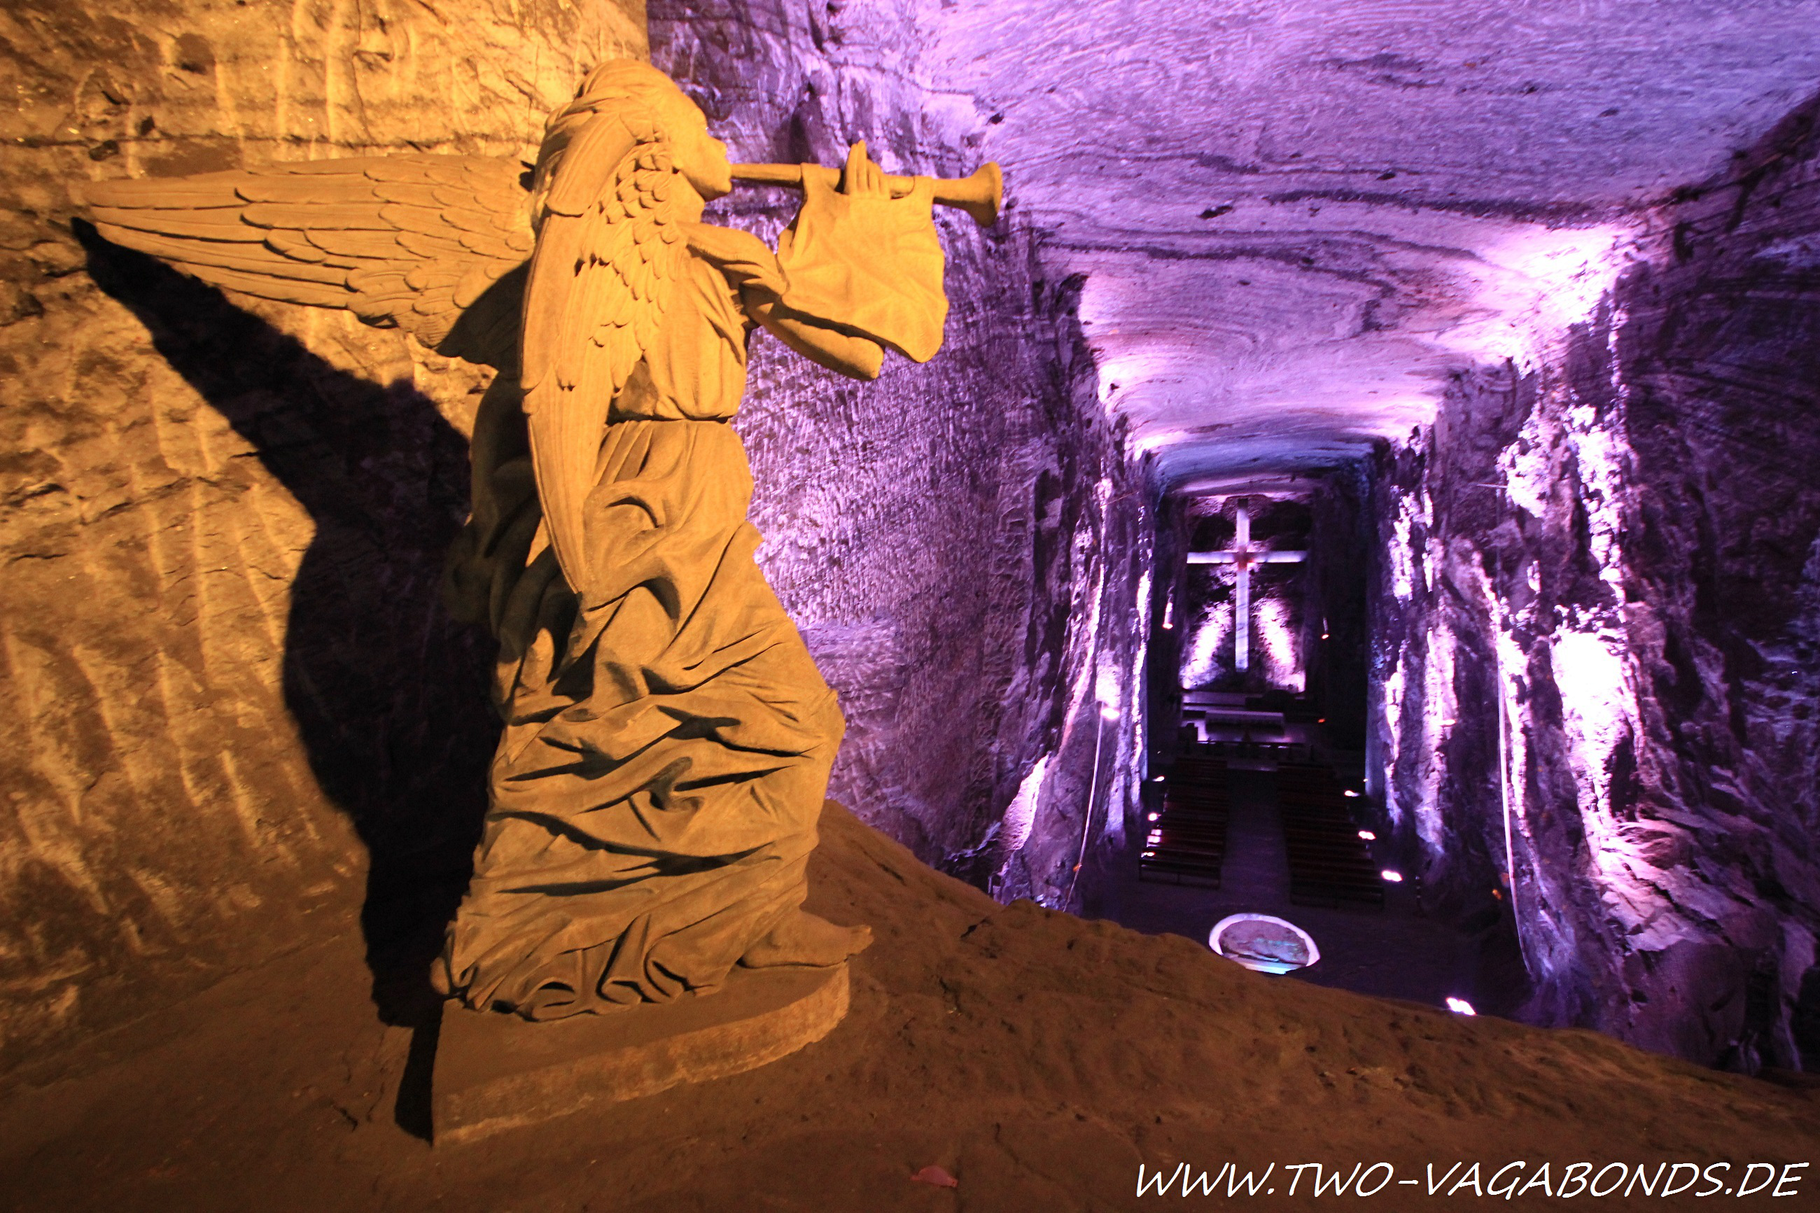 KOLUMBIEN 2014 - SALT CATHEDRAL